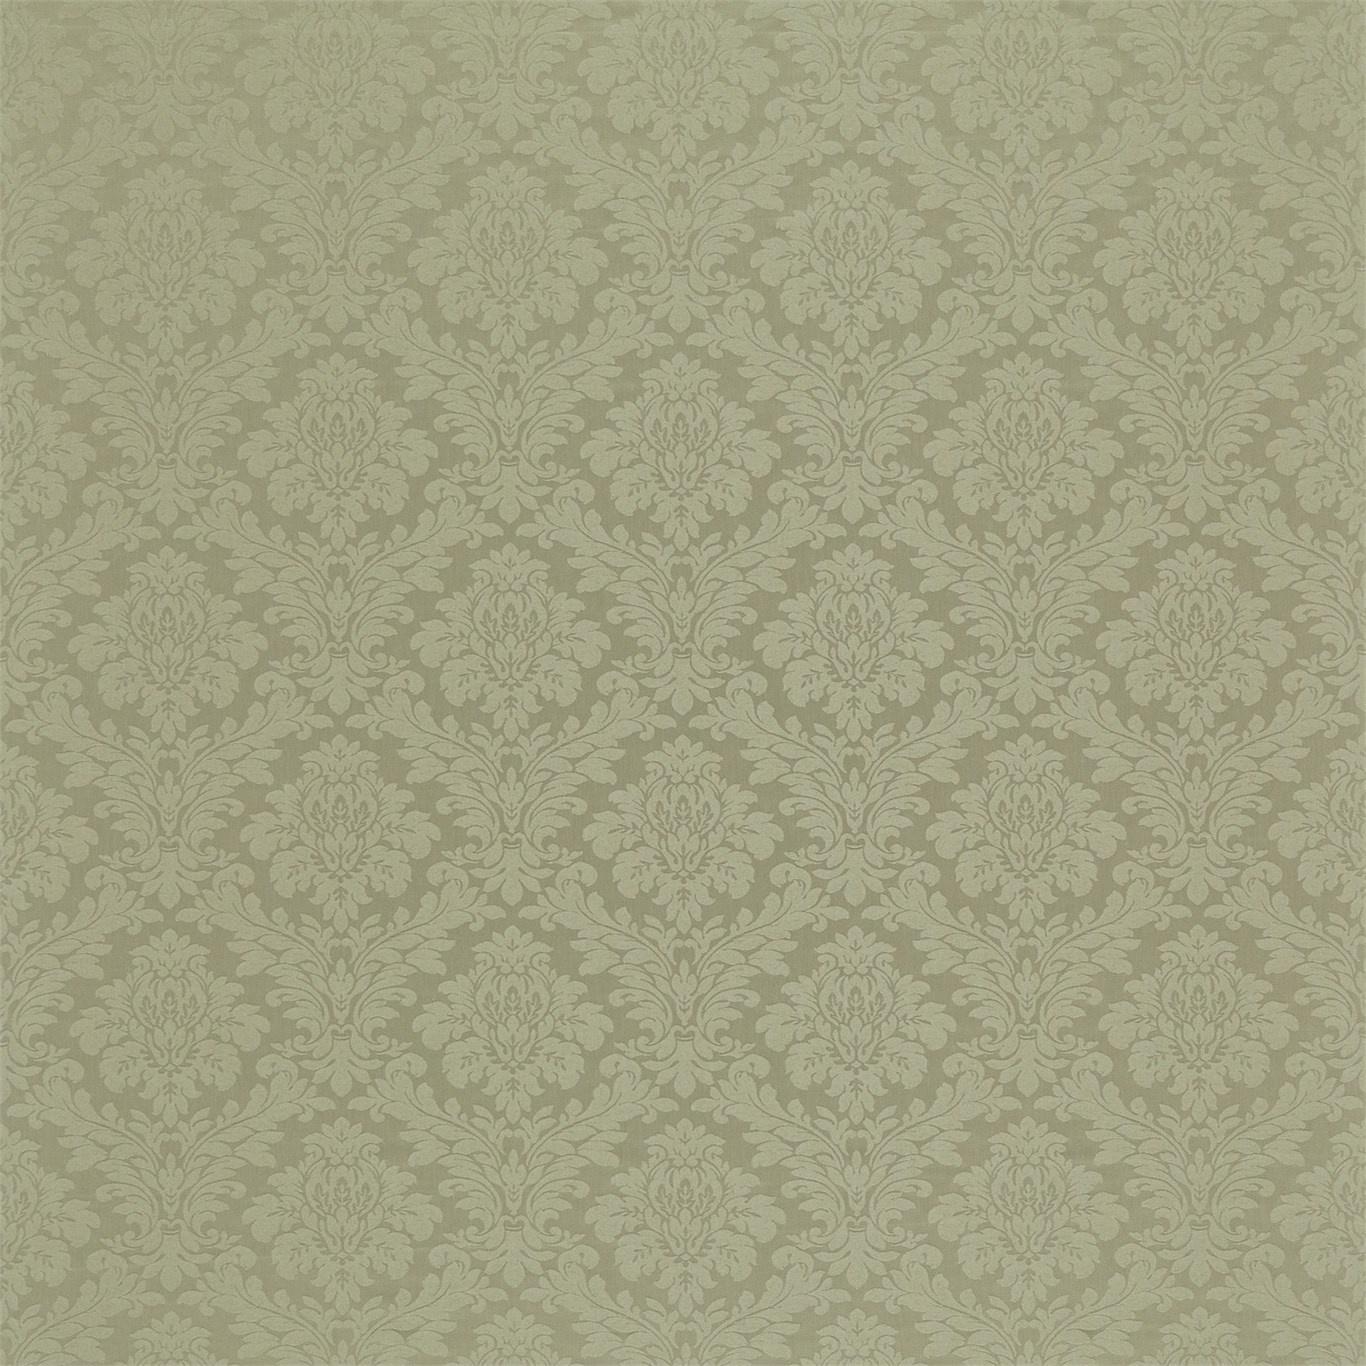 Image of Sanderson Lymington Damask Thyme Fabric 232611